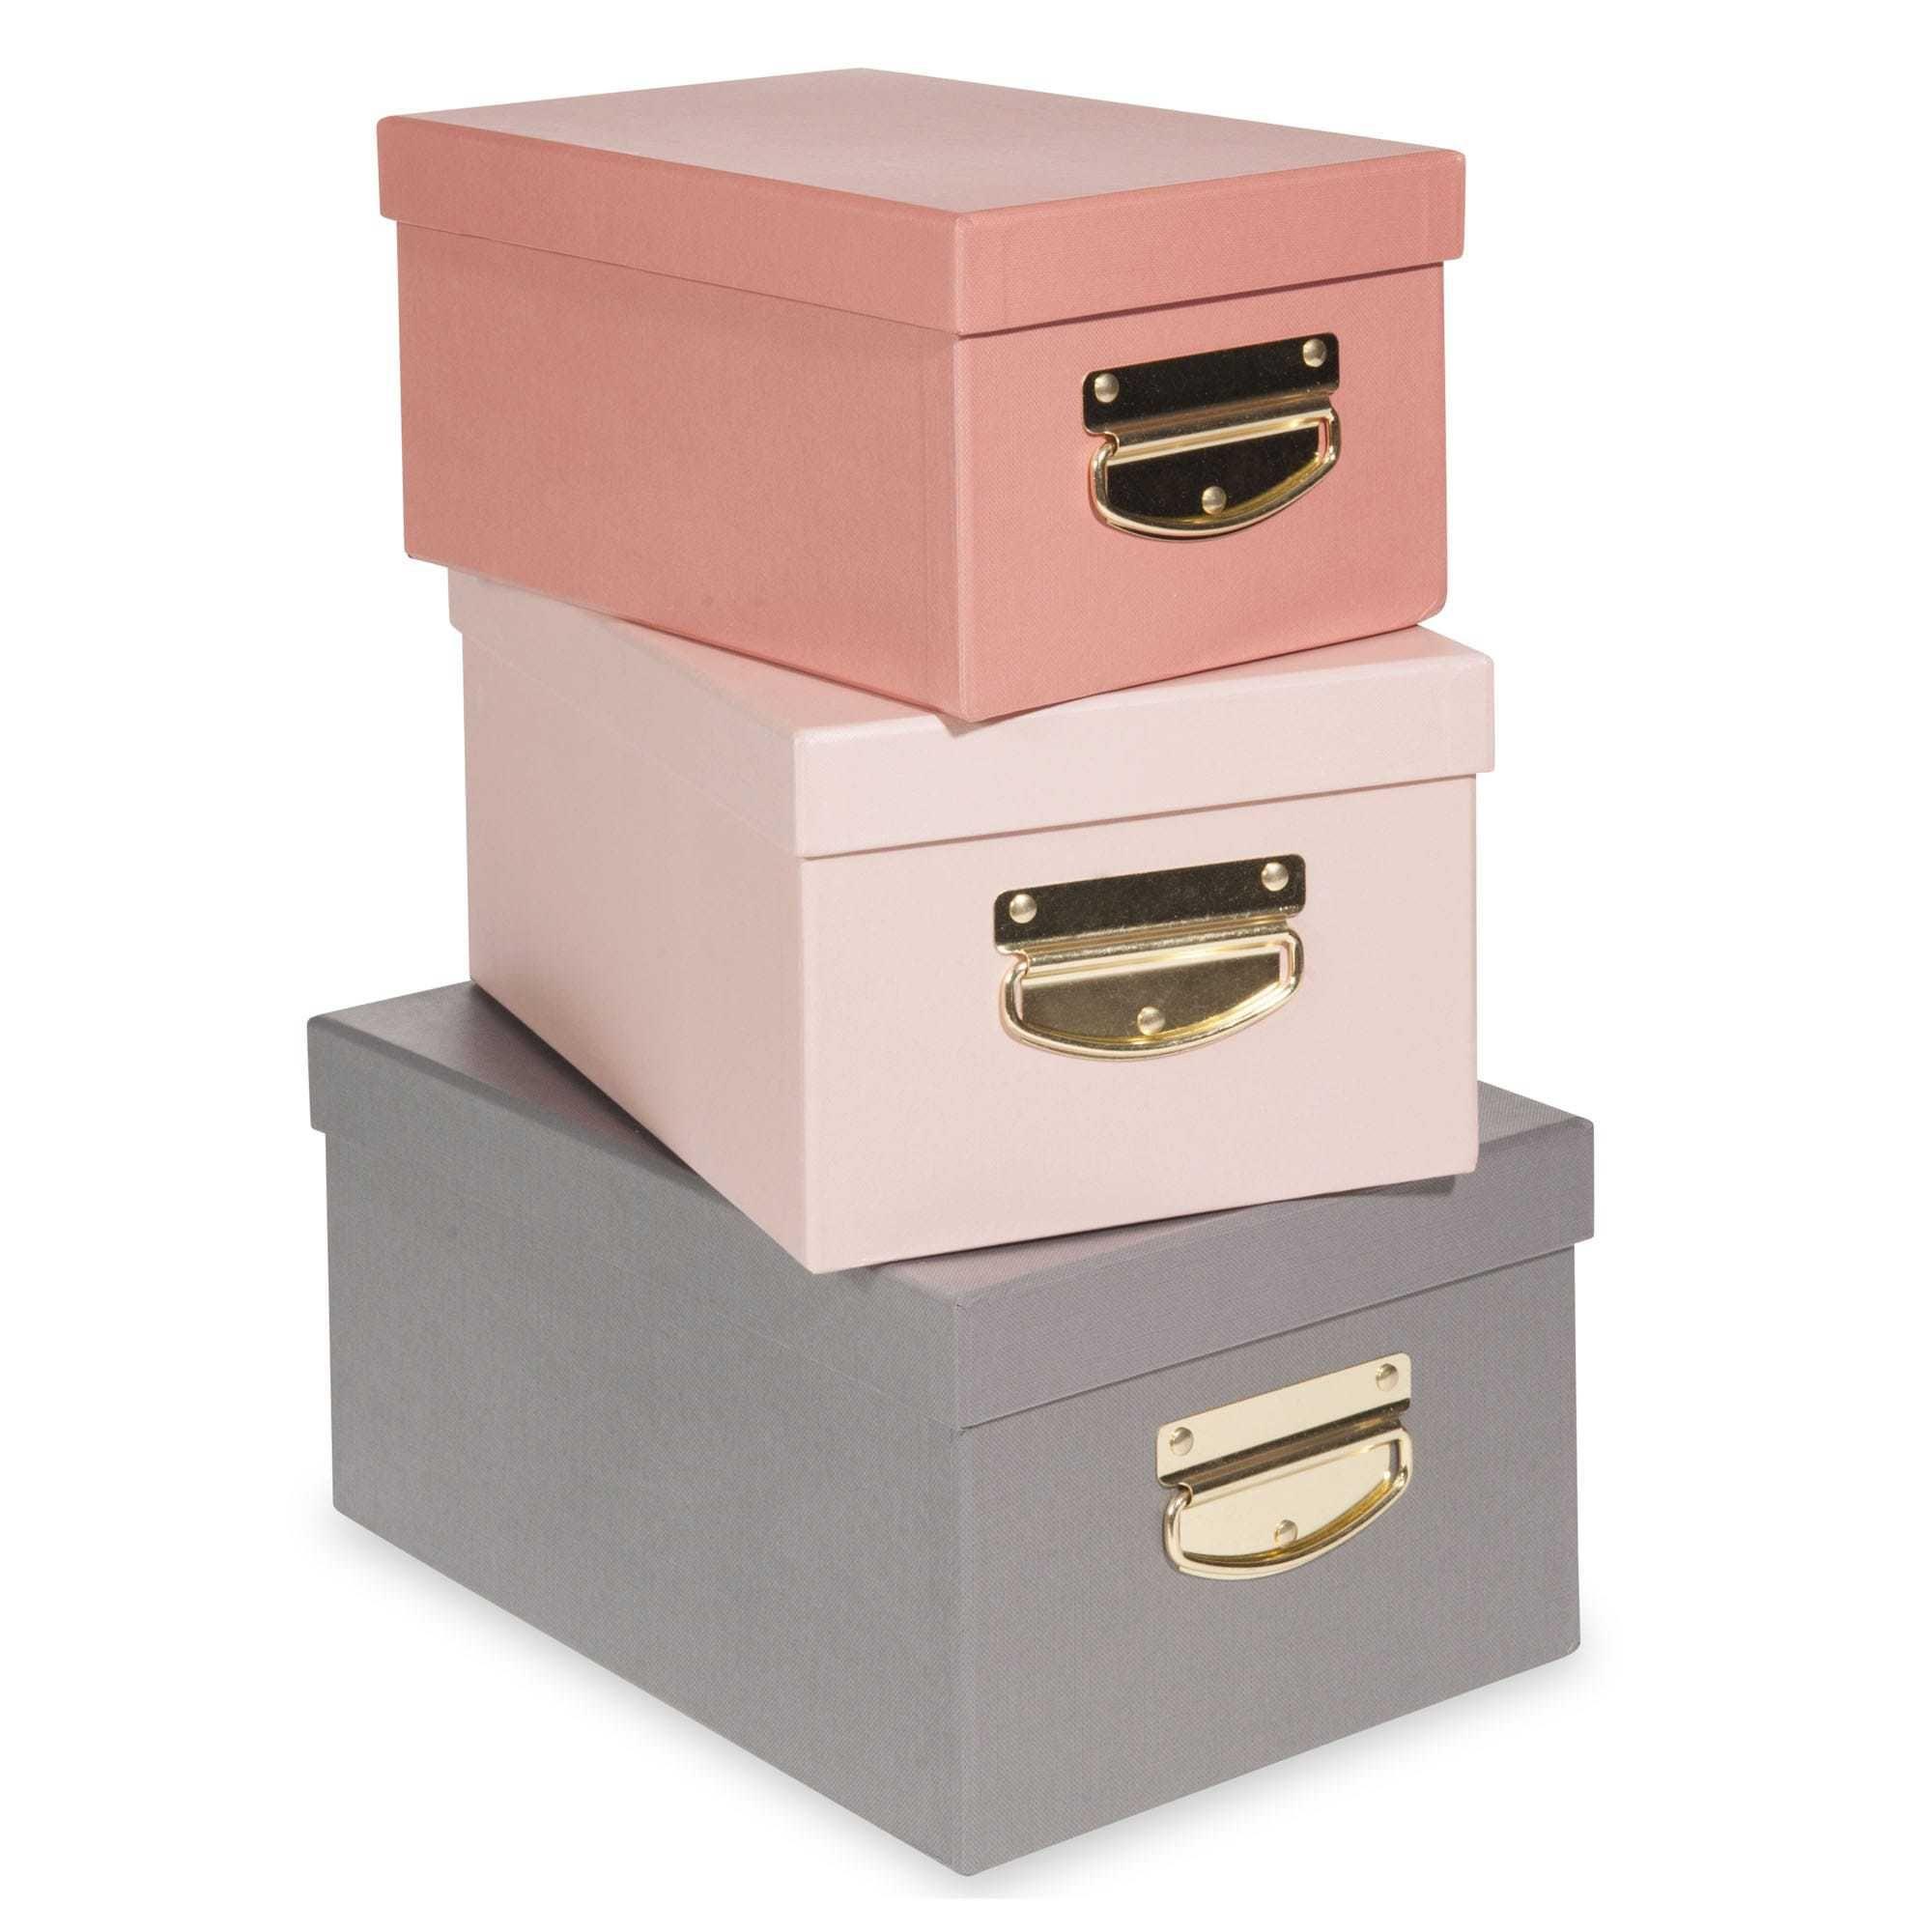 Almacenaje Cajas Cardboard Storage Storage Boxes Cute